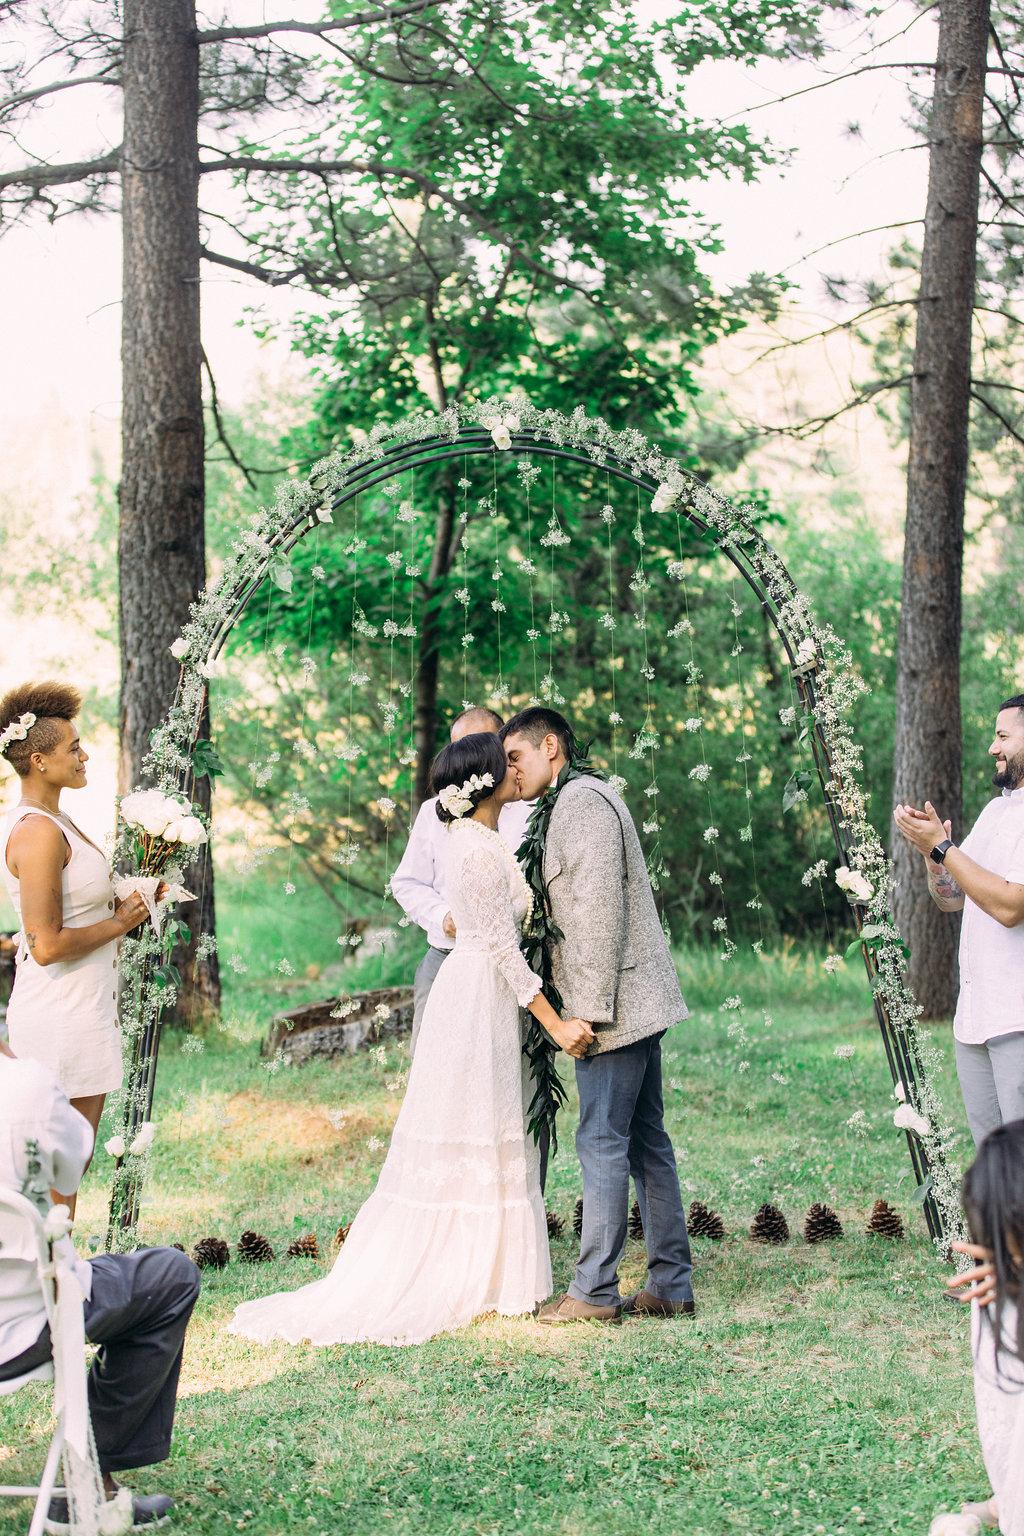 000023_gallardo_wedding0195.jpg